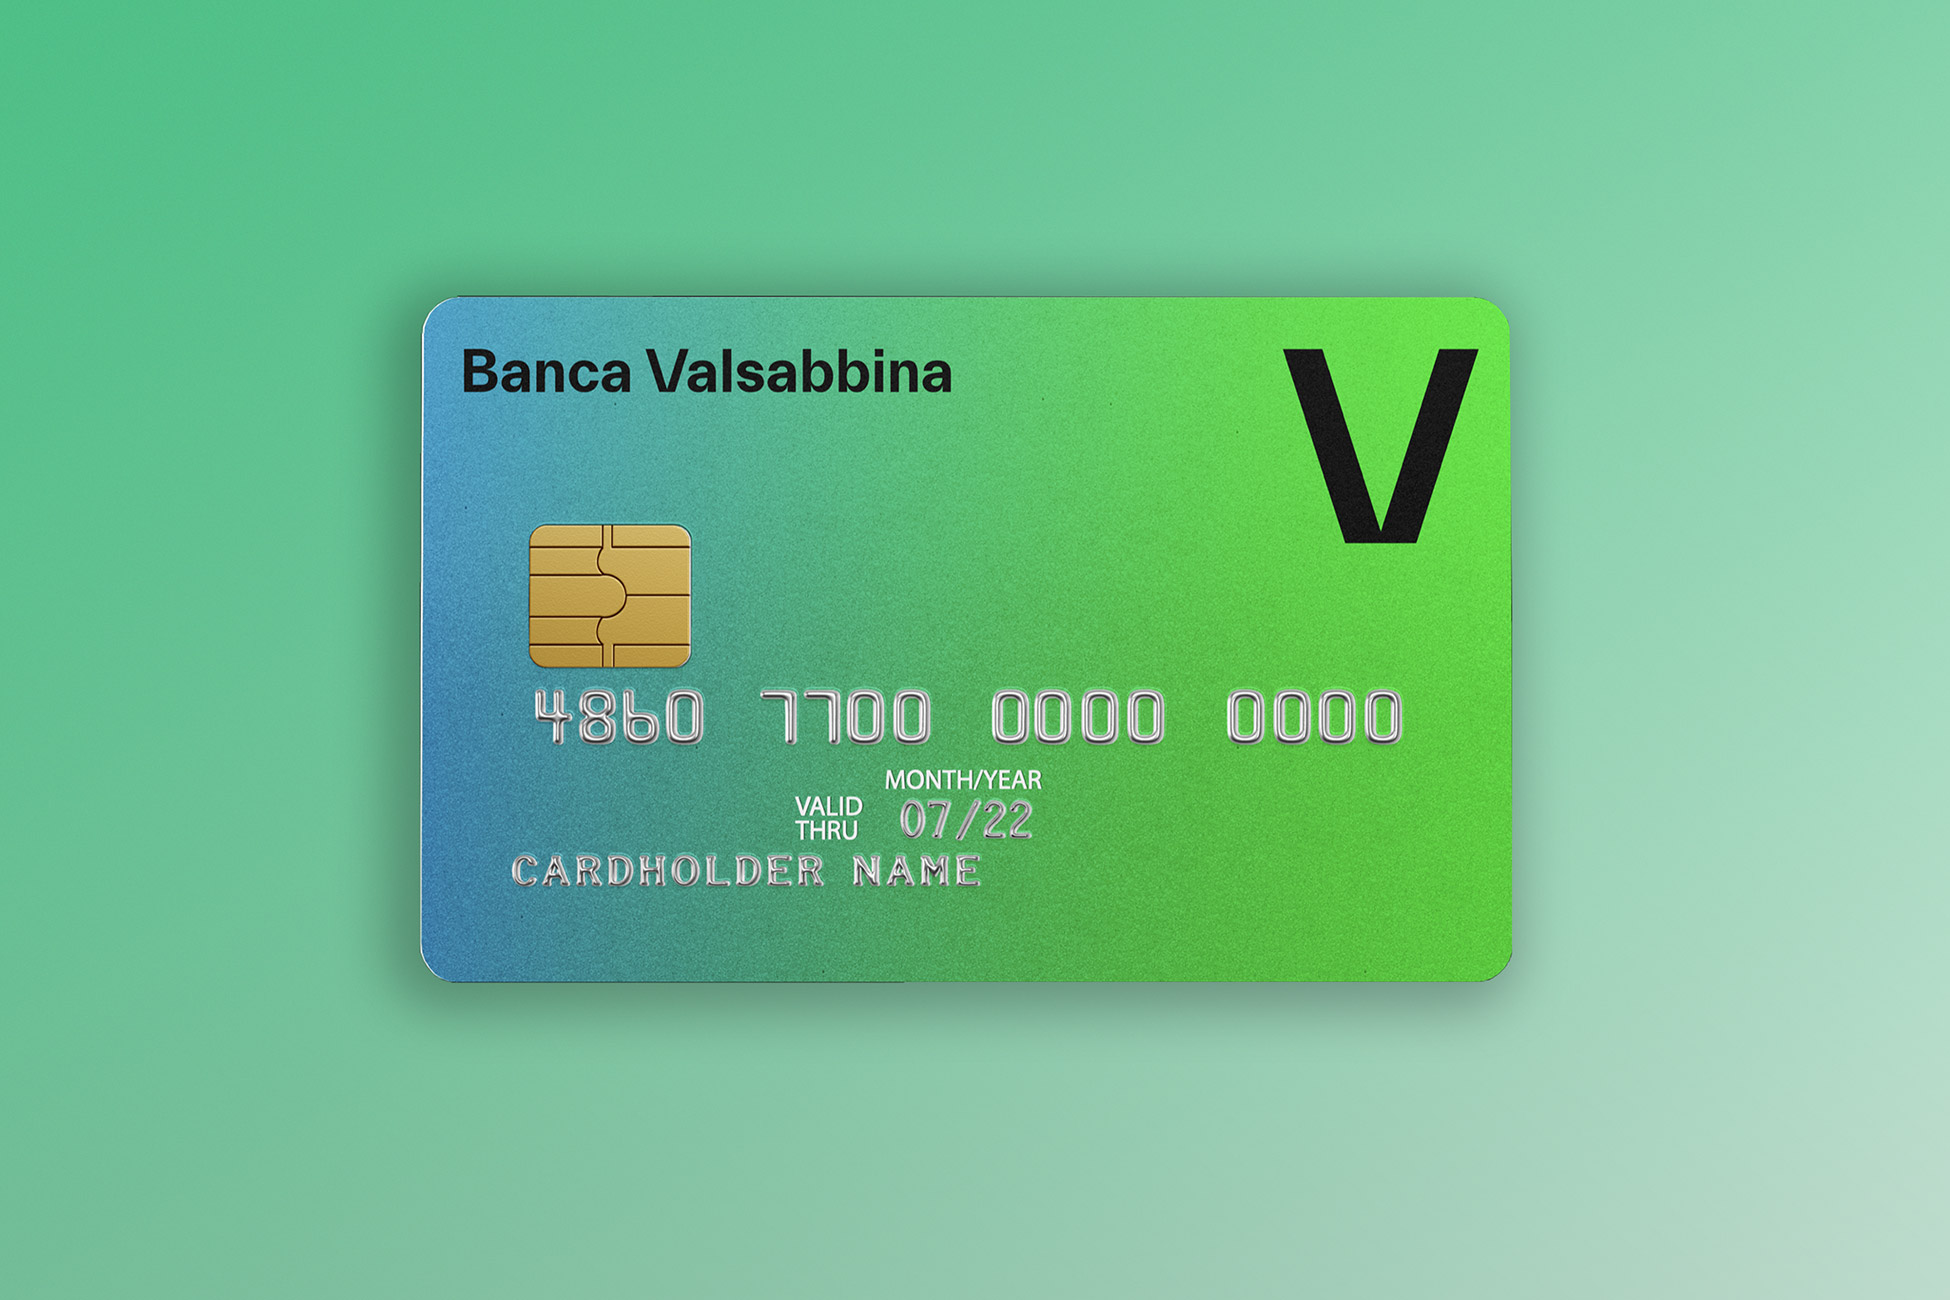 carte debito hero | Banca Valsabbina